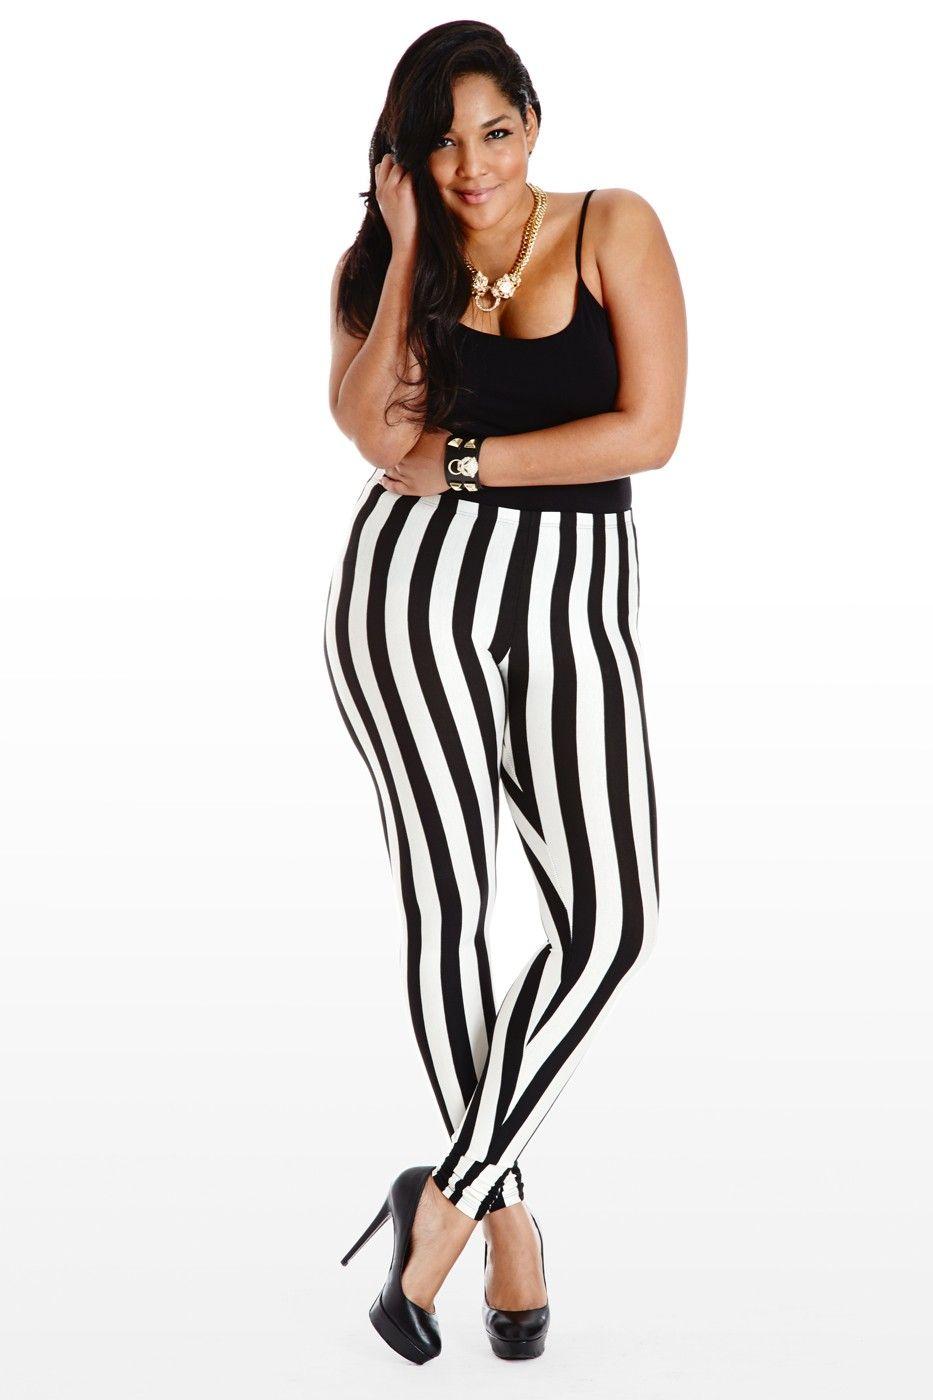 e939f025b7dfc1 Memorize My Lines Striped Plus Size Leggings   Plus Size Fashion and ...